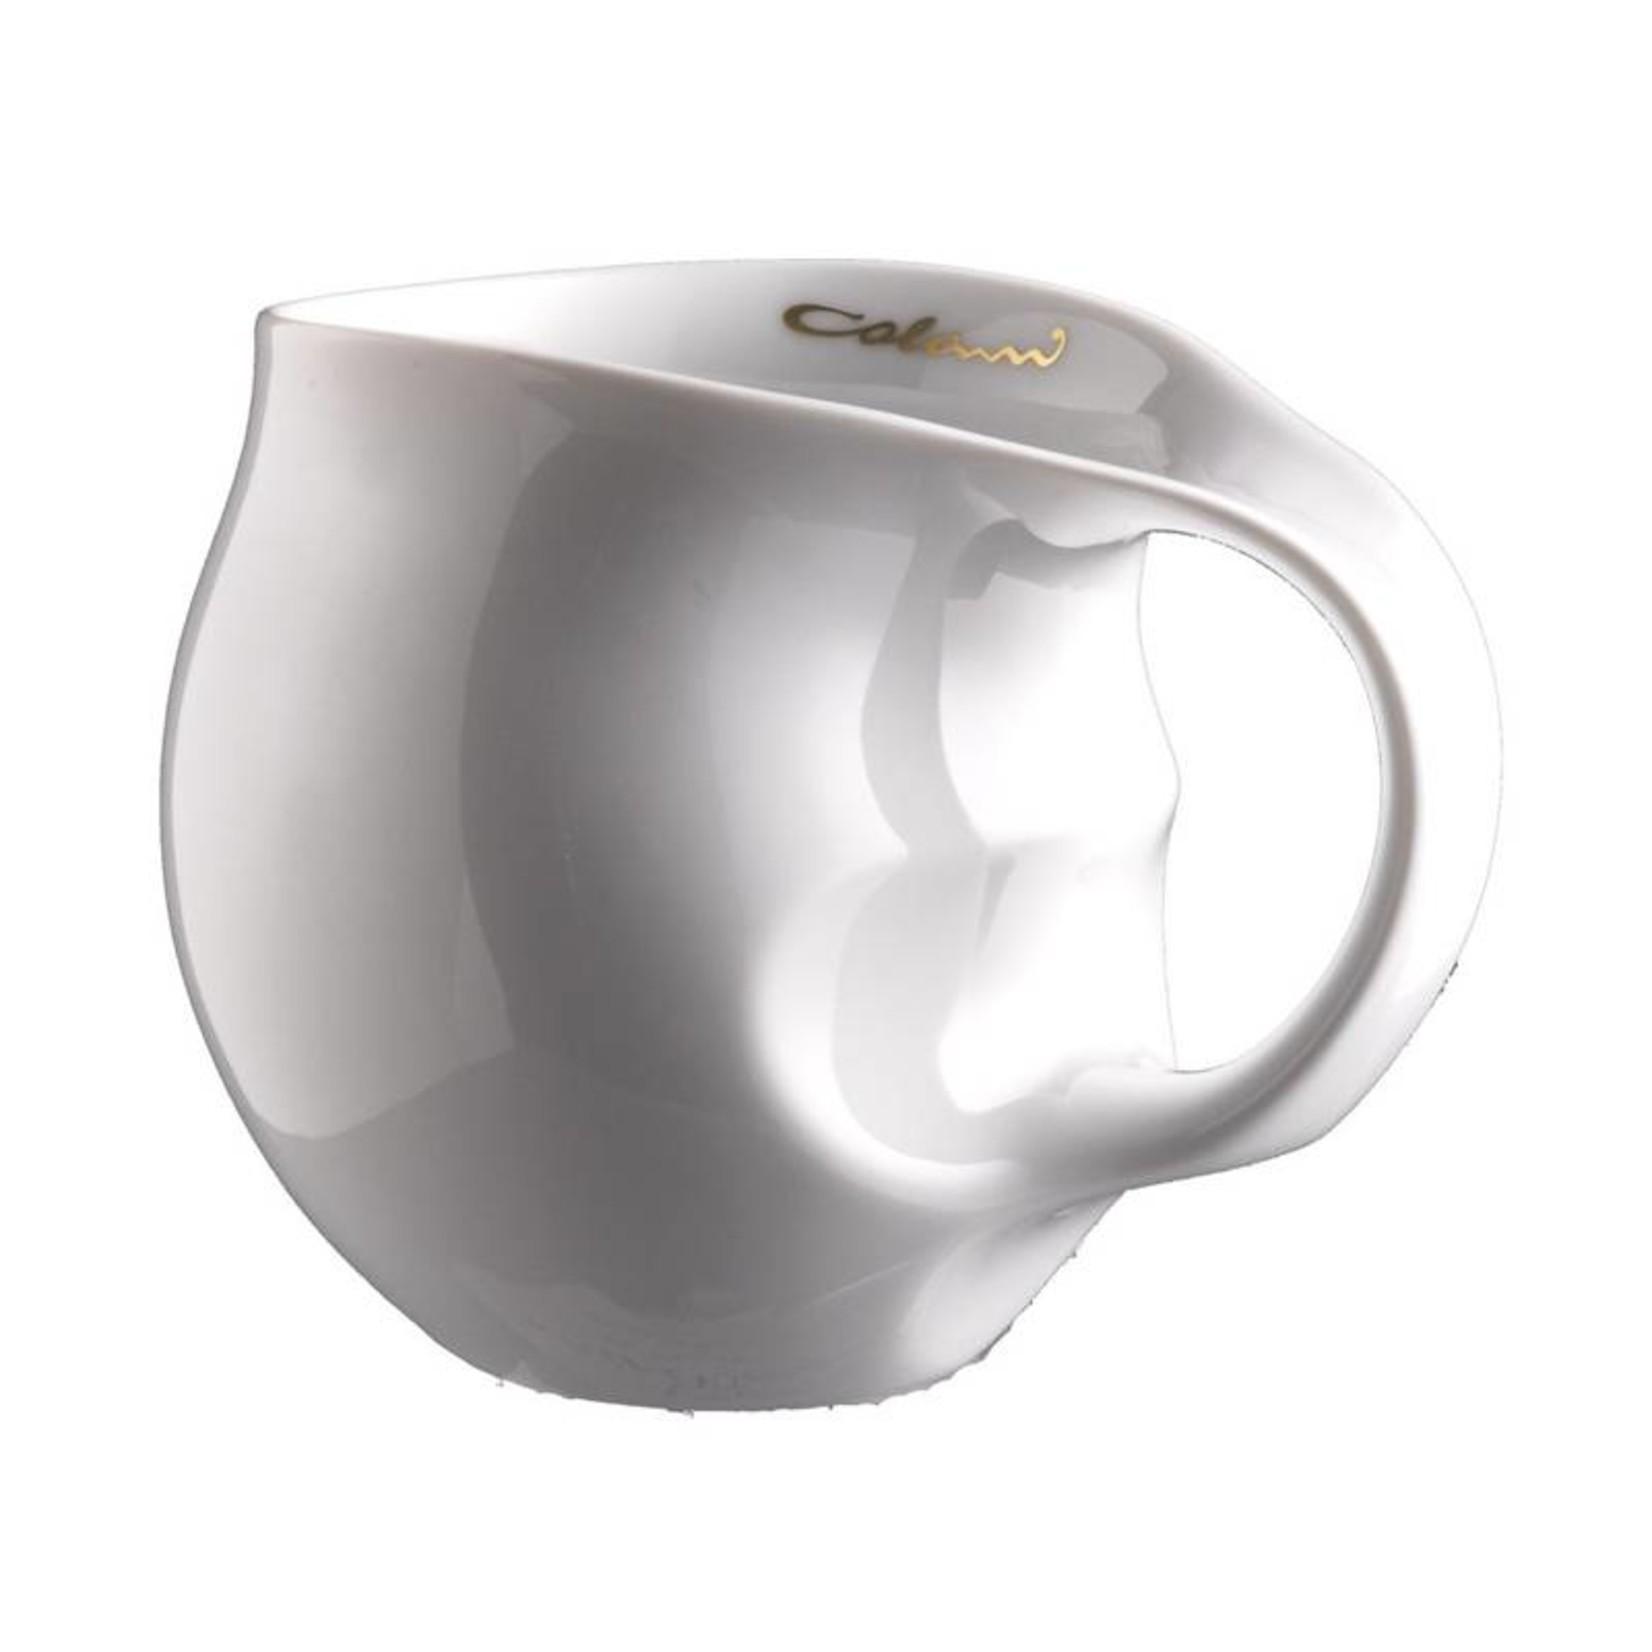 Colani Porzellanserie Colani Kaffeebecher | weiß | Porzellan | Luigi Colani Design